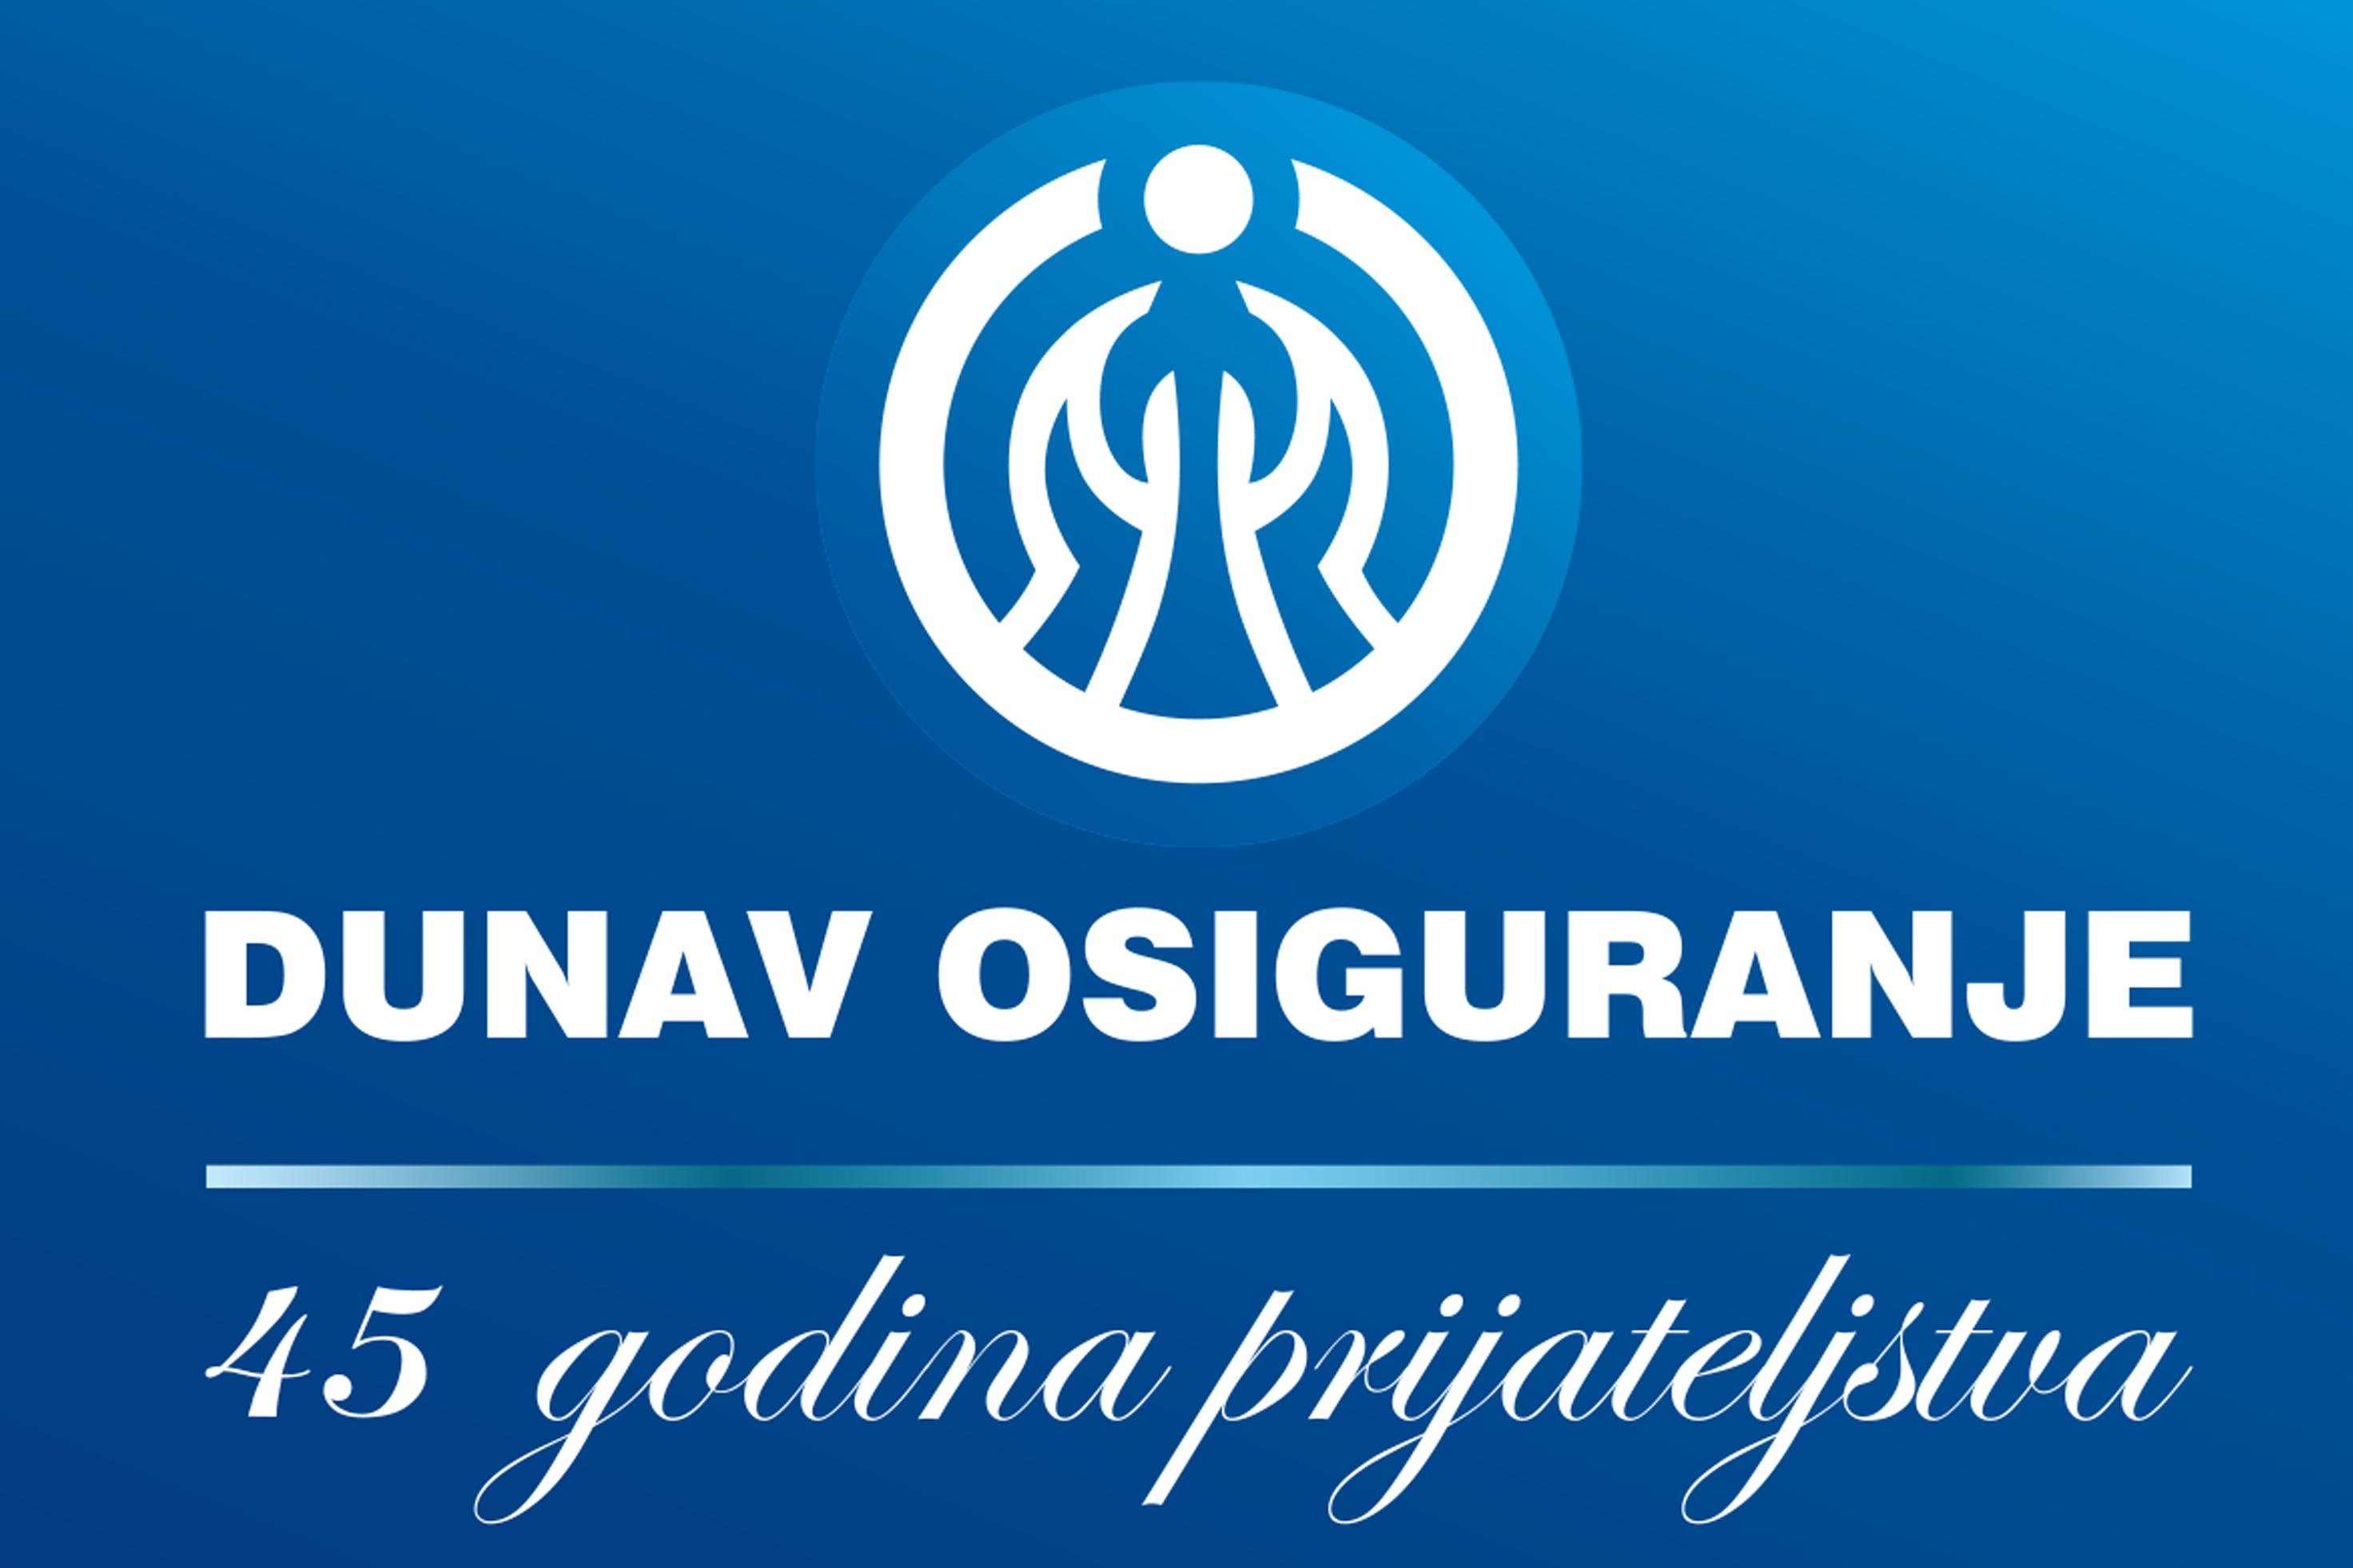 Dunav osiguranje-znak i logotip-45 godina-latinica